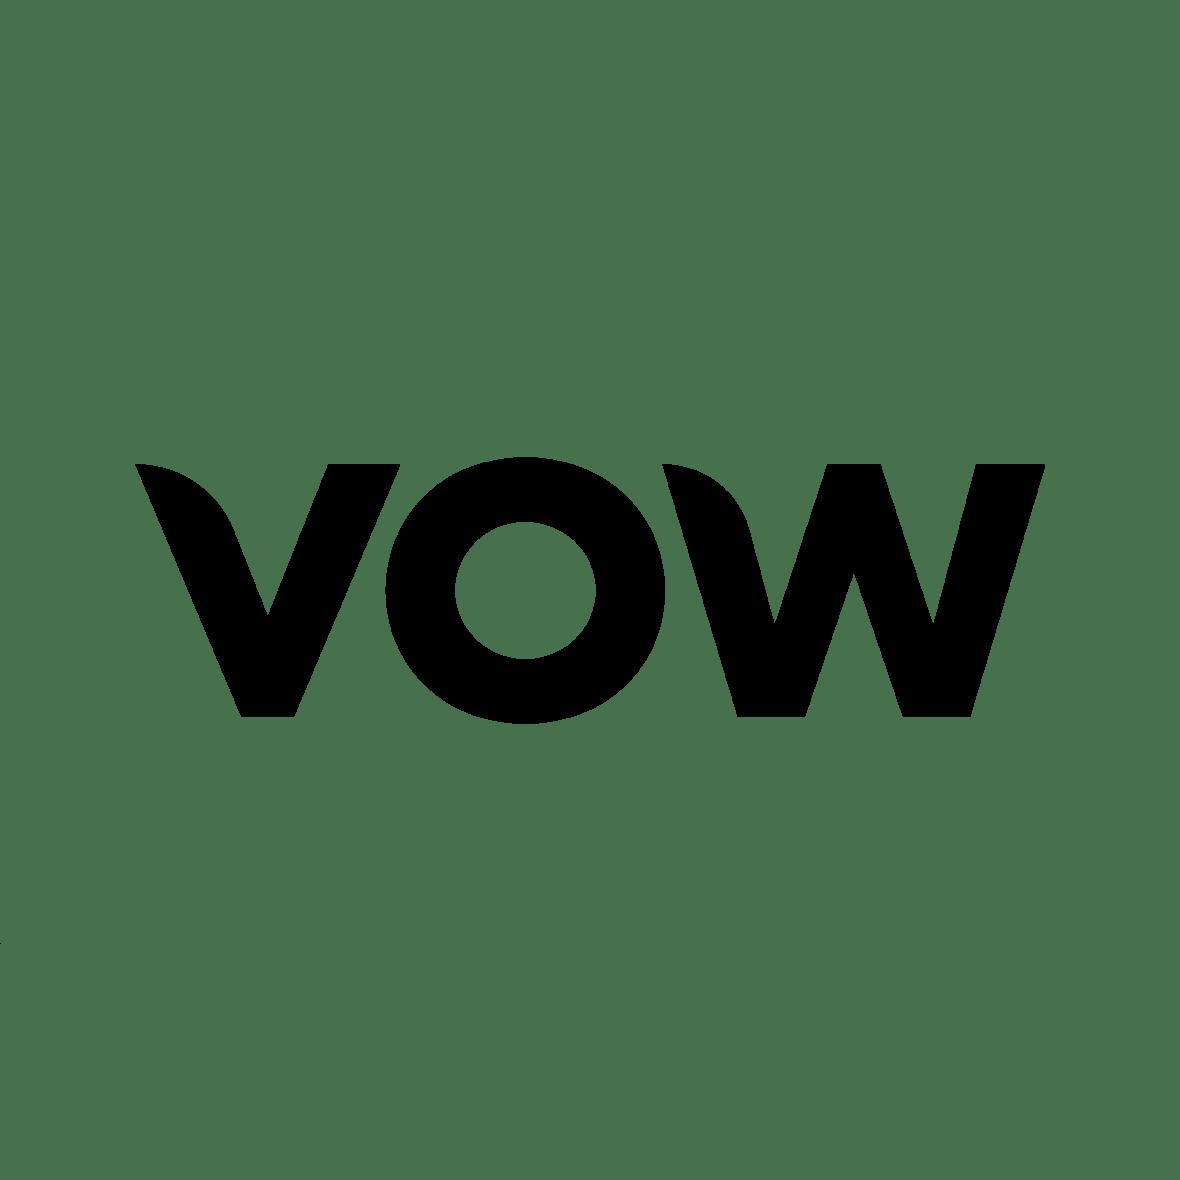 VOW ASA | Fundamentale Aktienanalyse